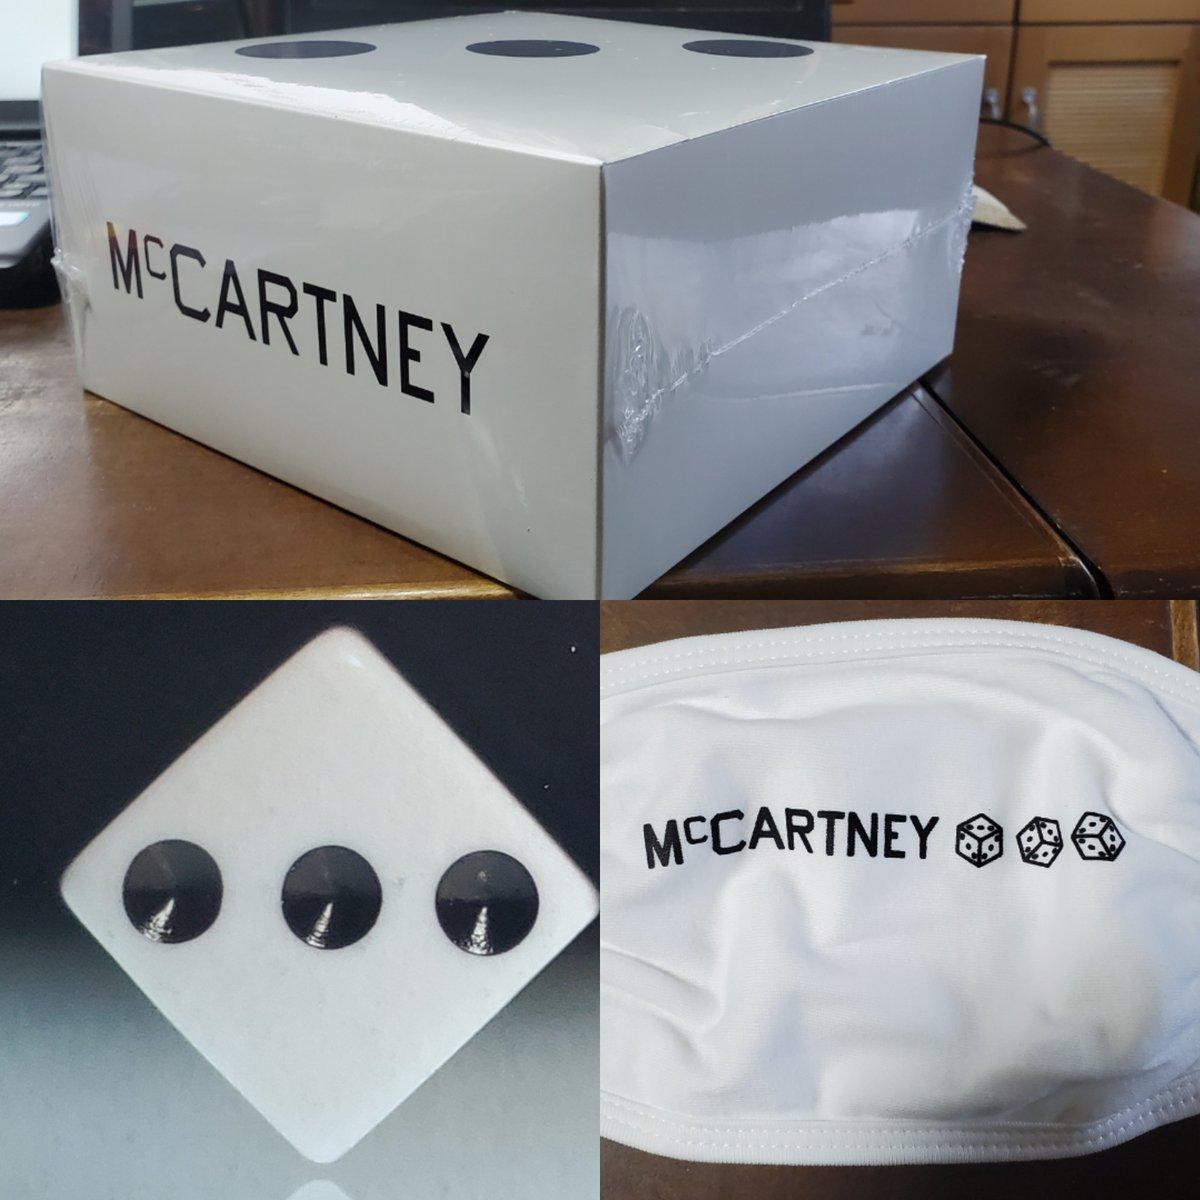 McCartney III - Secret Demo Edition White Cover CD and Mask Box Set が無事到着したが中身がマスクとCDだけなのに箱がイヤにデカイ。マスクは白なので普段使いできそうだが最近不織布マスク以外はしづらいので電車に乗らない日だけ使うか。 #PaulMcCartney  #McCartneyIII